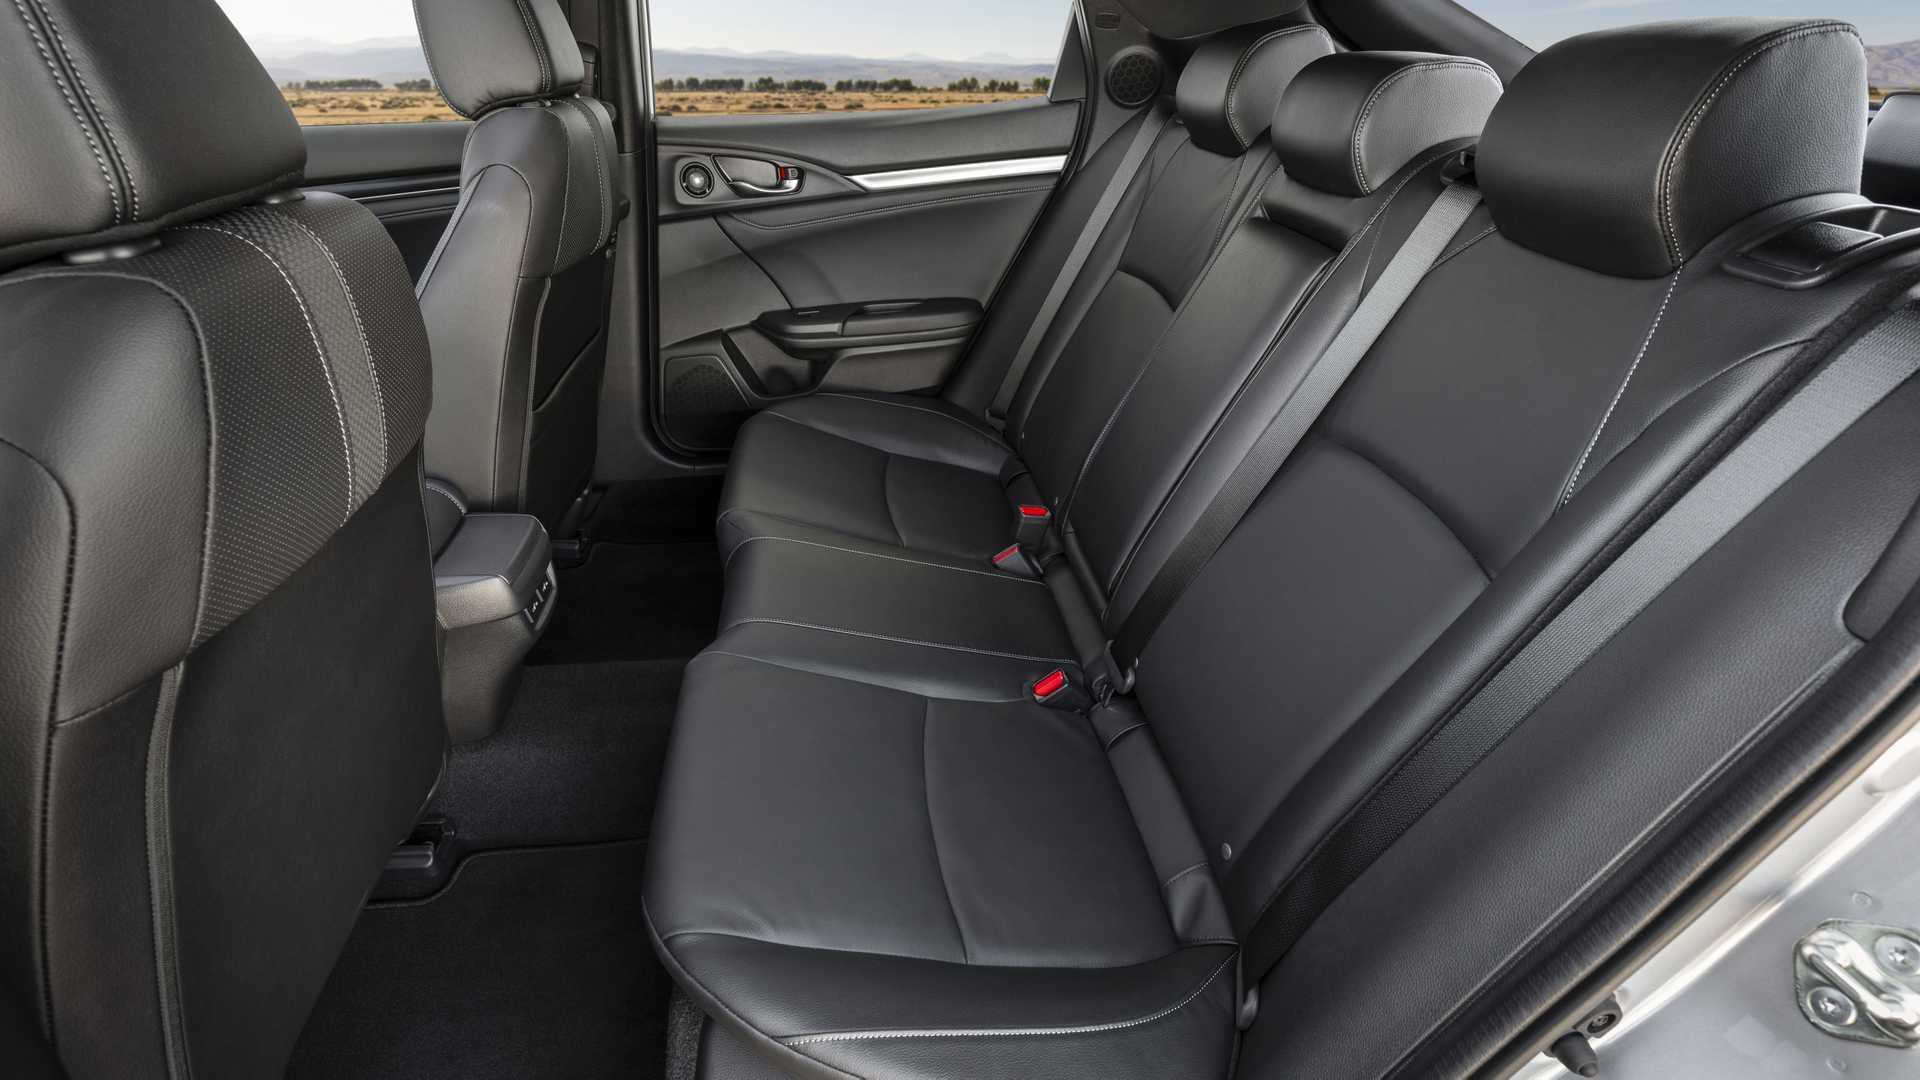 2020 Honda Civic Hatchback Interior Rear Seats Wallpapers (7)